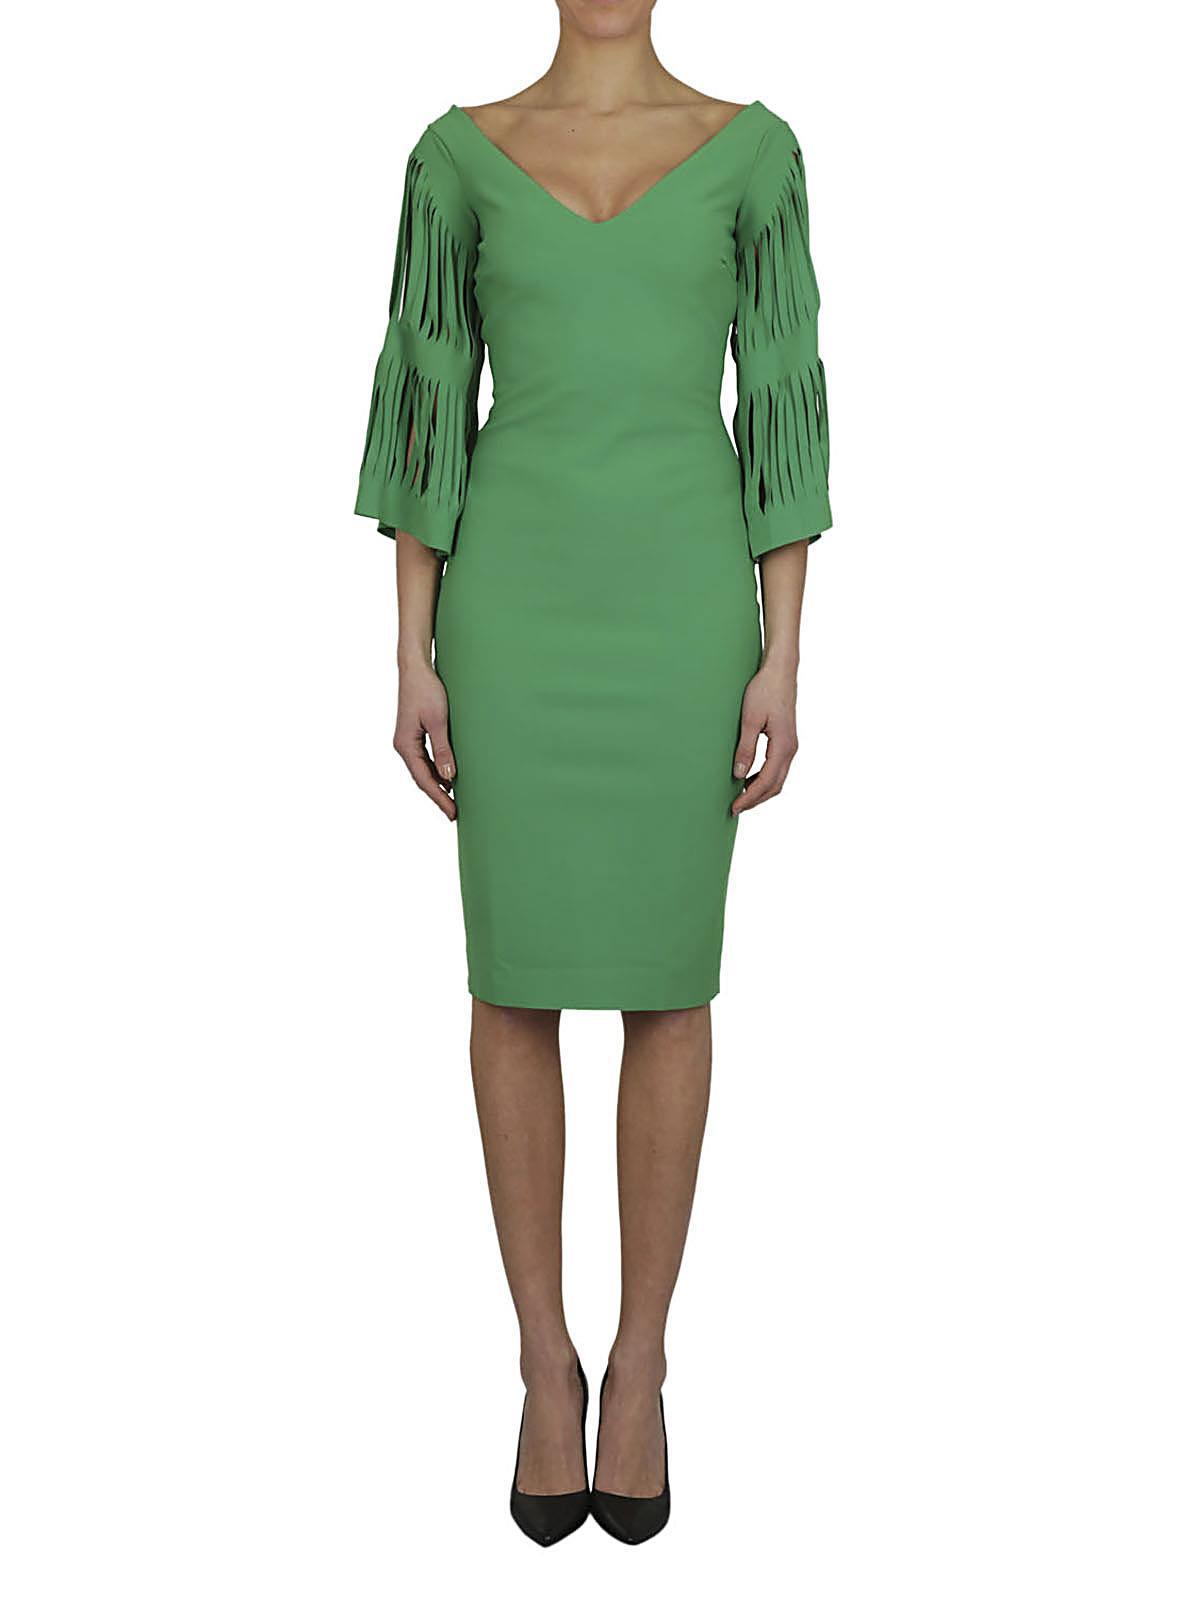 c591f29ace3d Lyst - Chiara Boni CHIARA BONI Abito tubino menta in Green